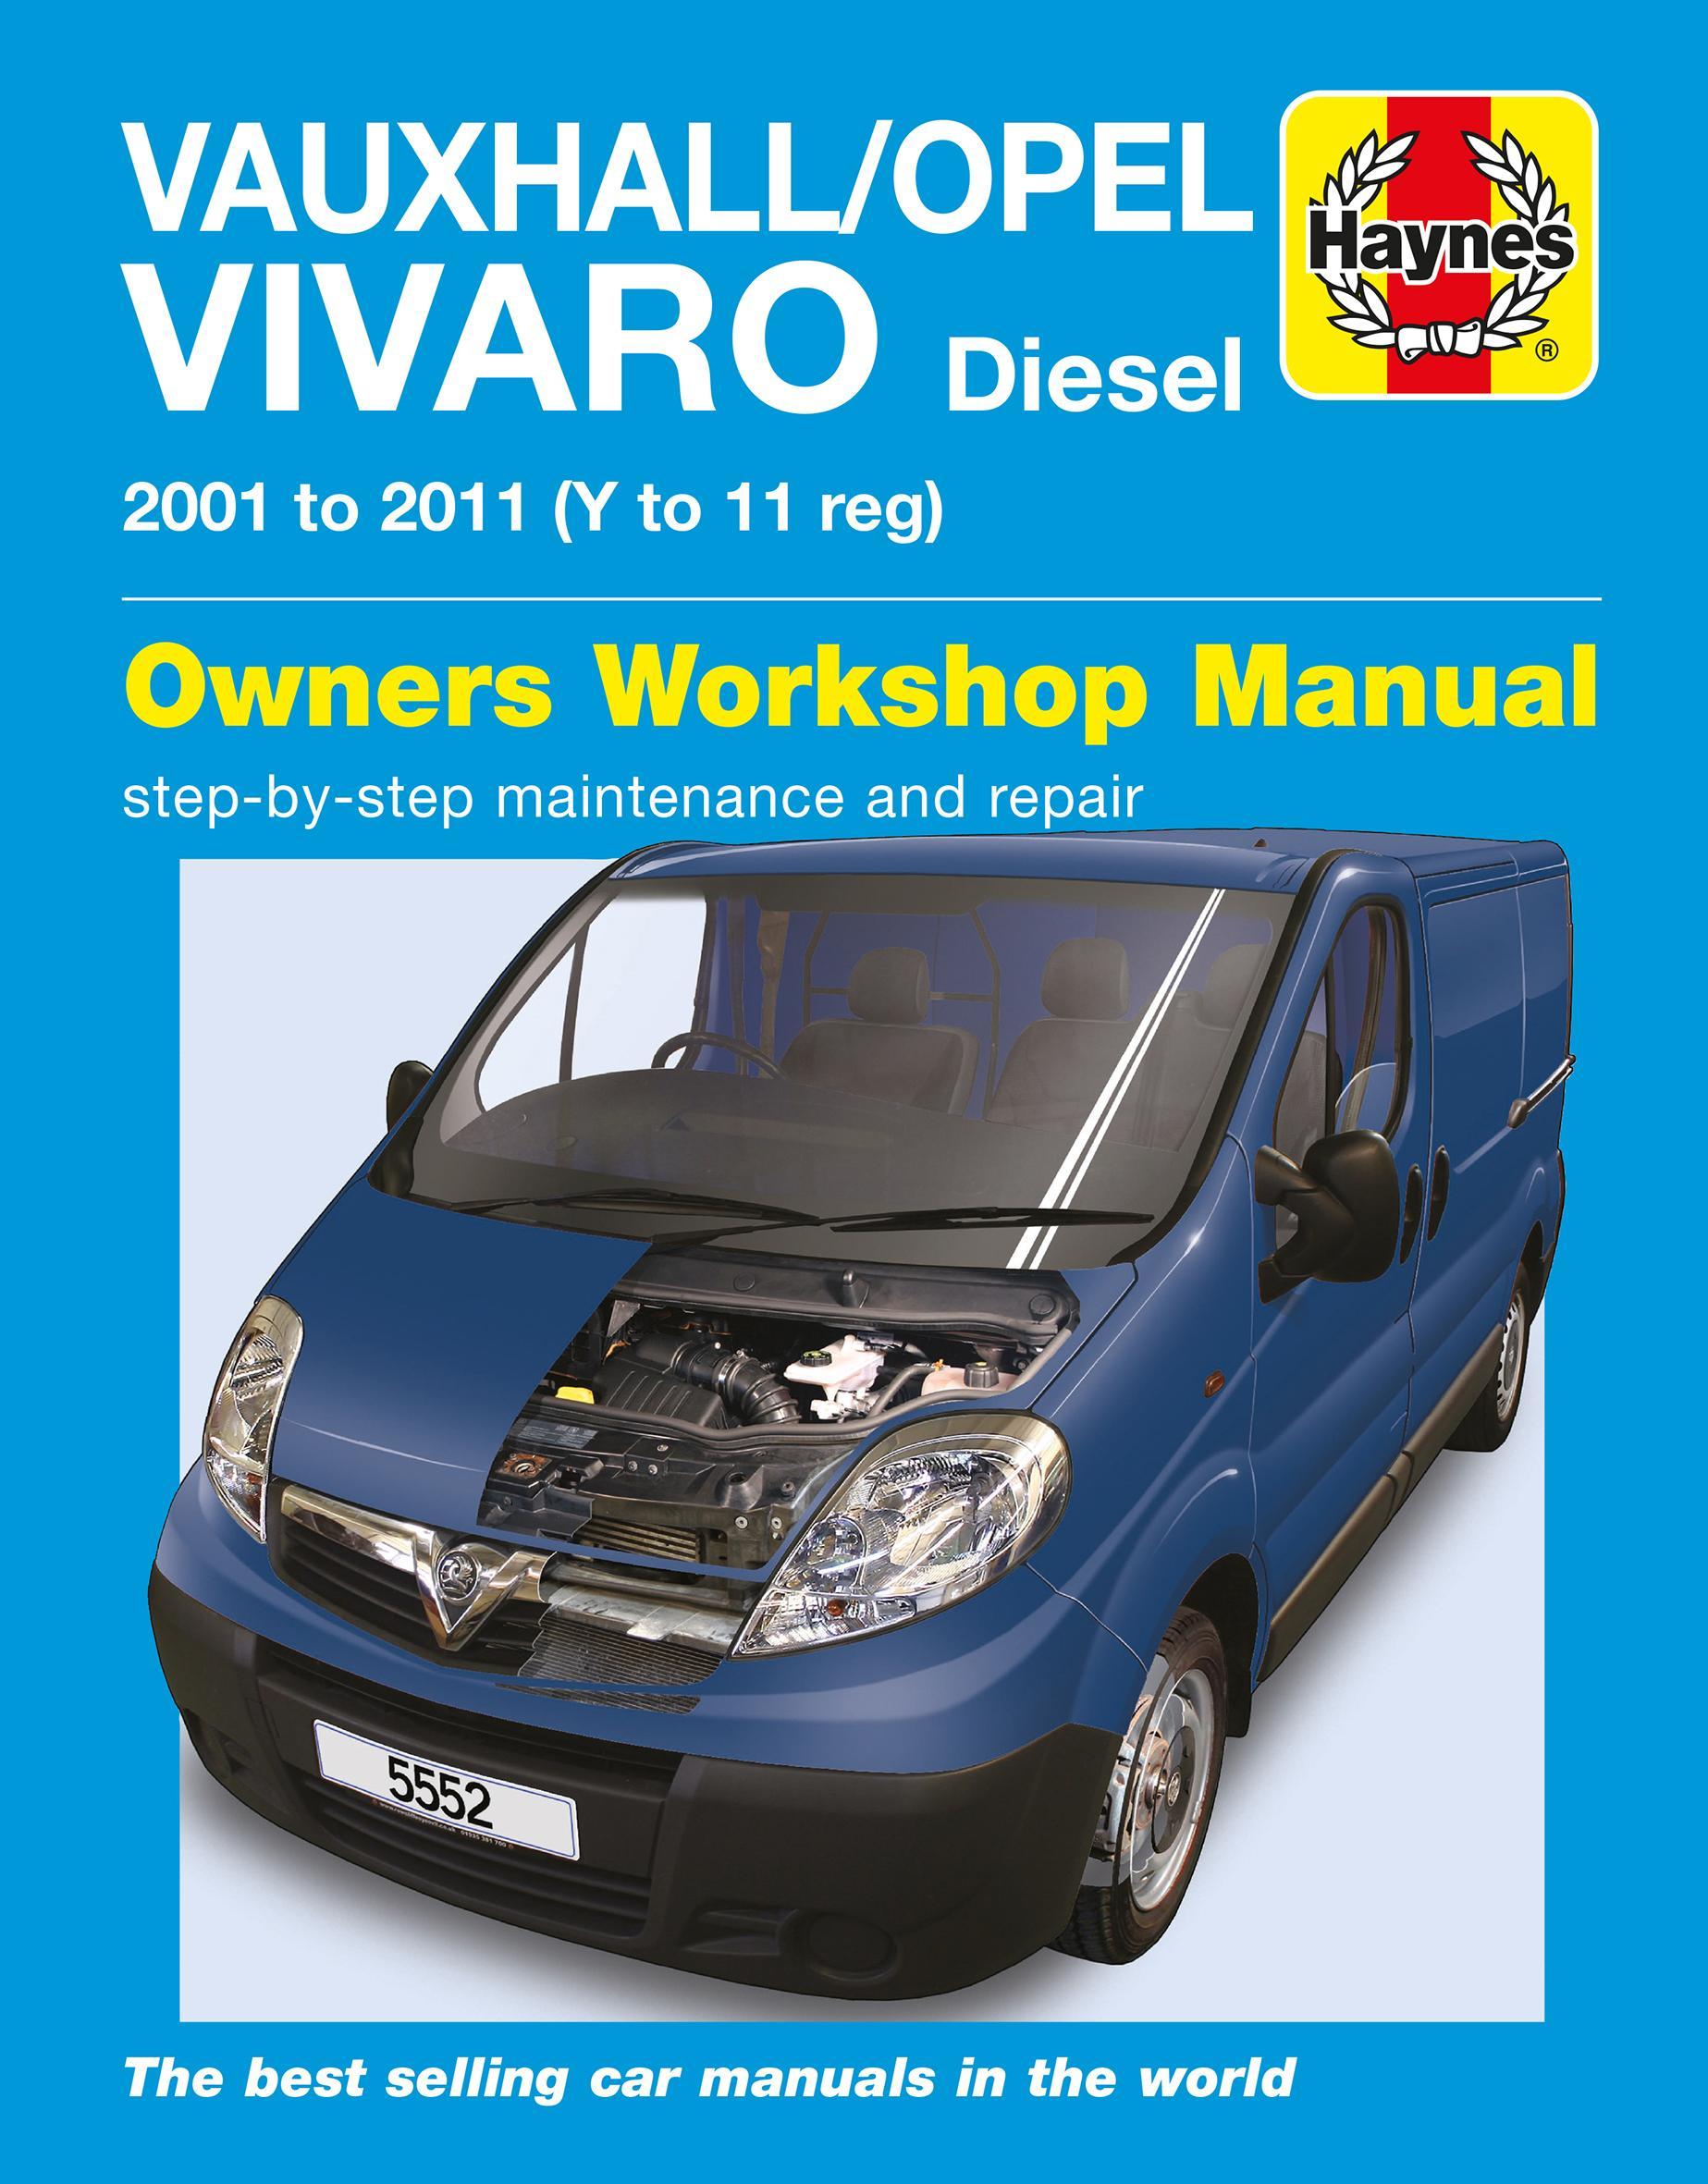 opel astra workshop repair and service manual html autos opel astra h 1.6 user manual Opel Astra 2013